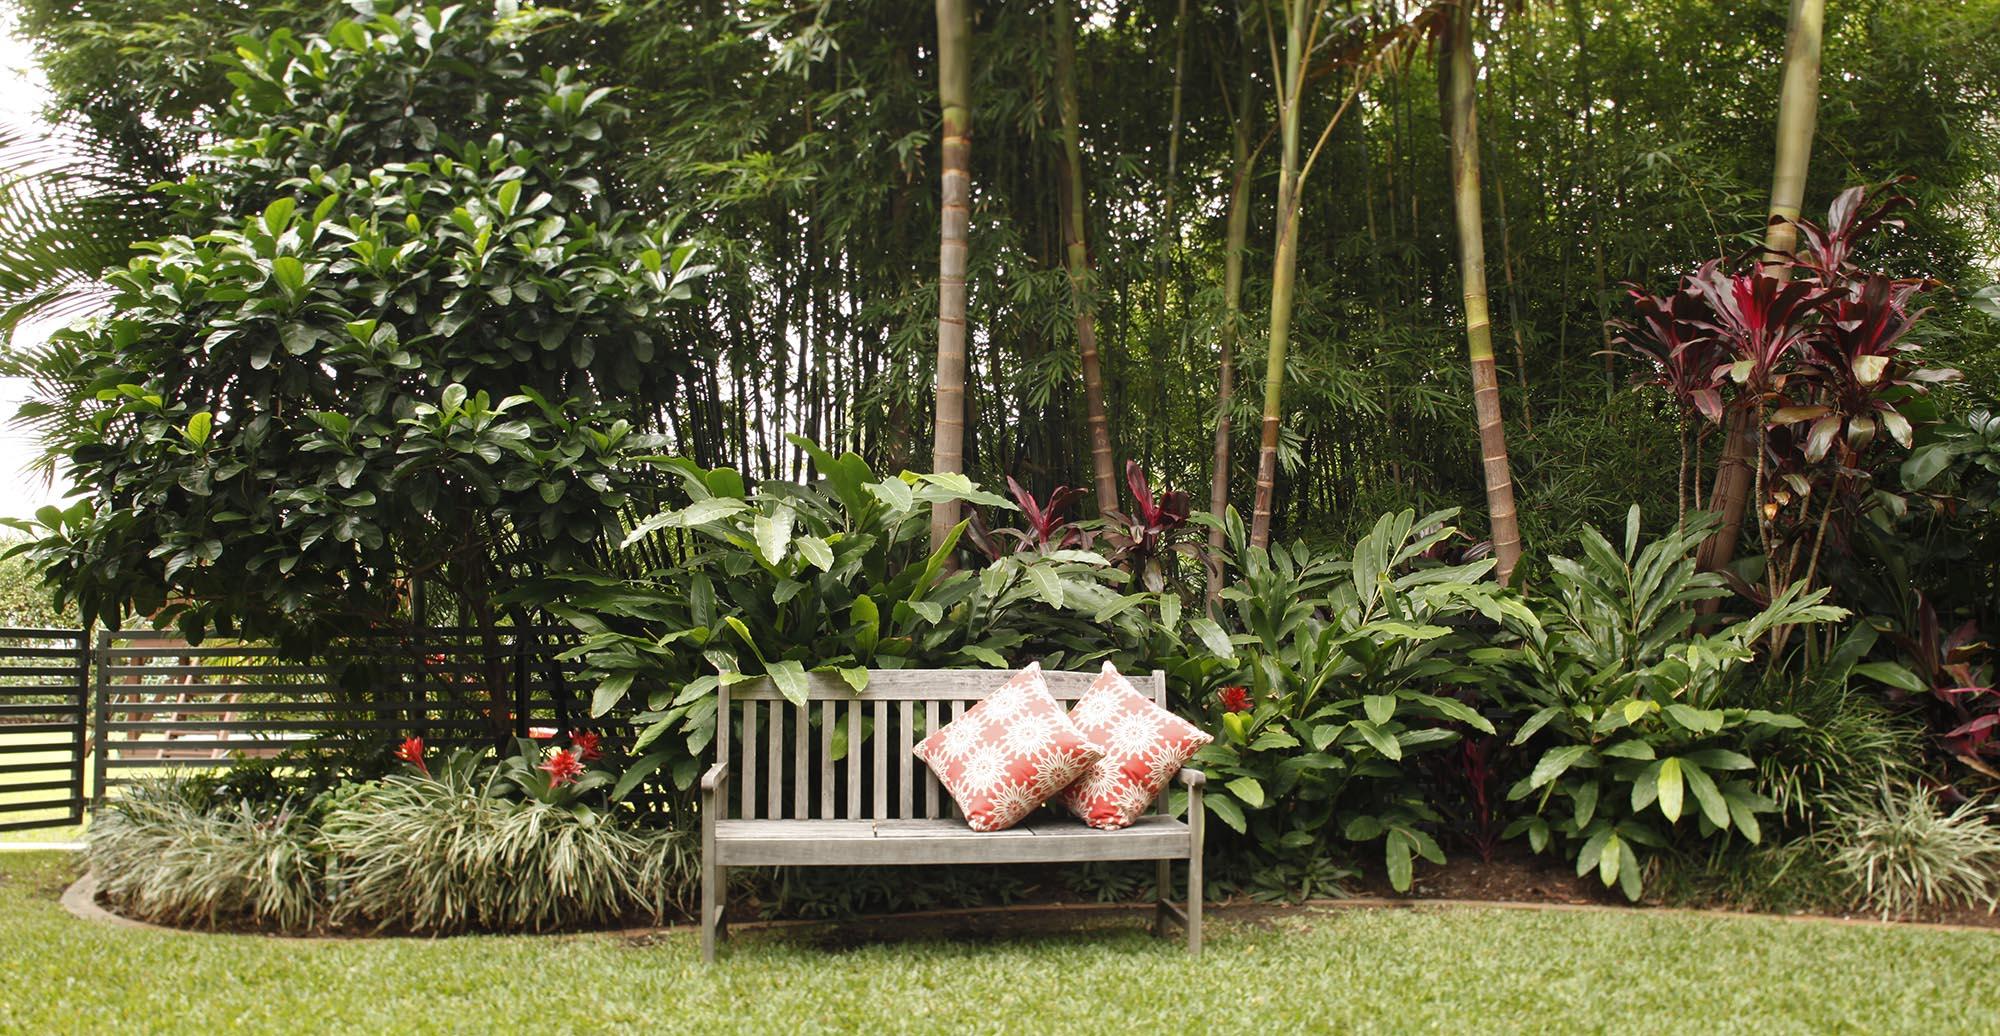 jardim tropical - entenda antes